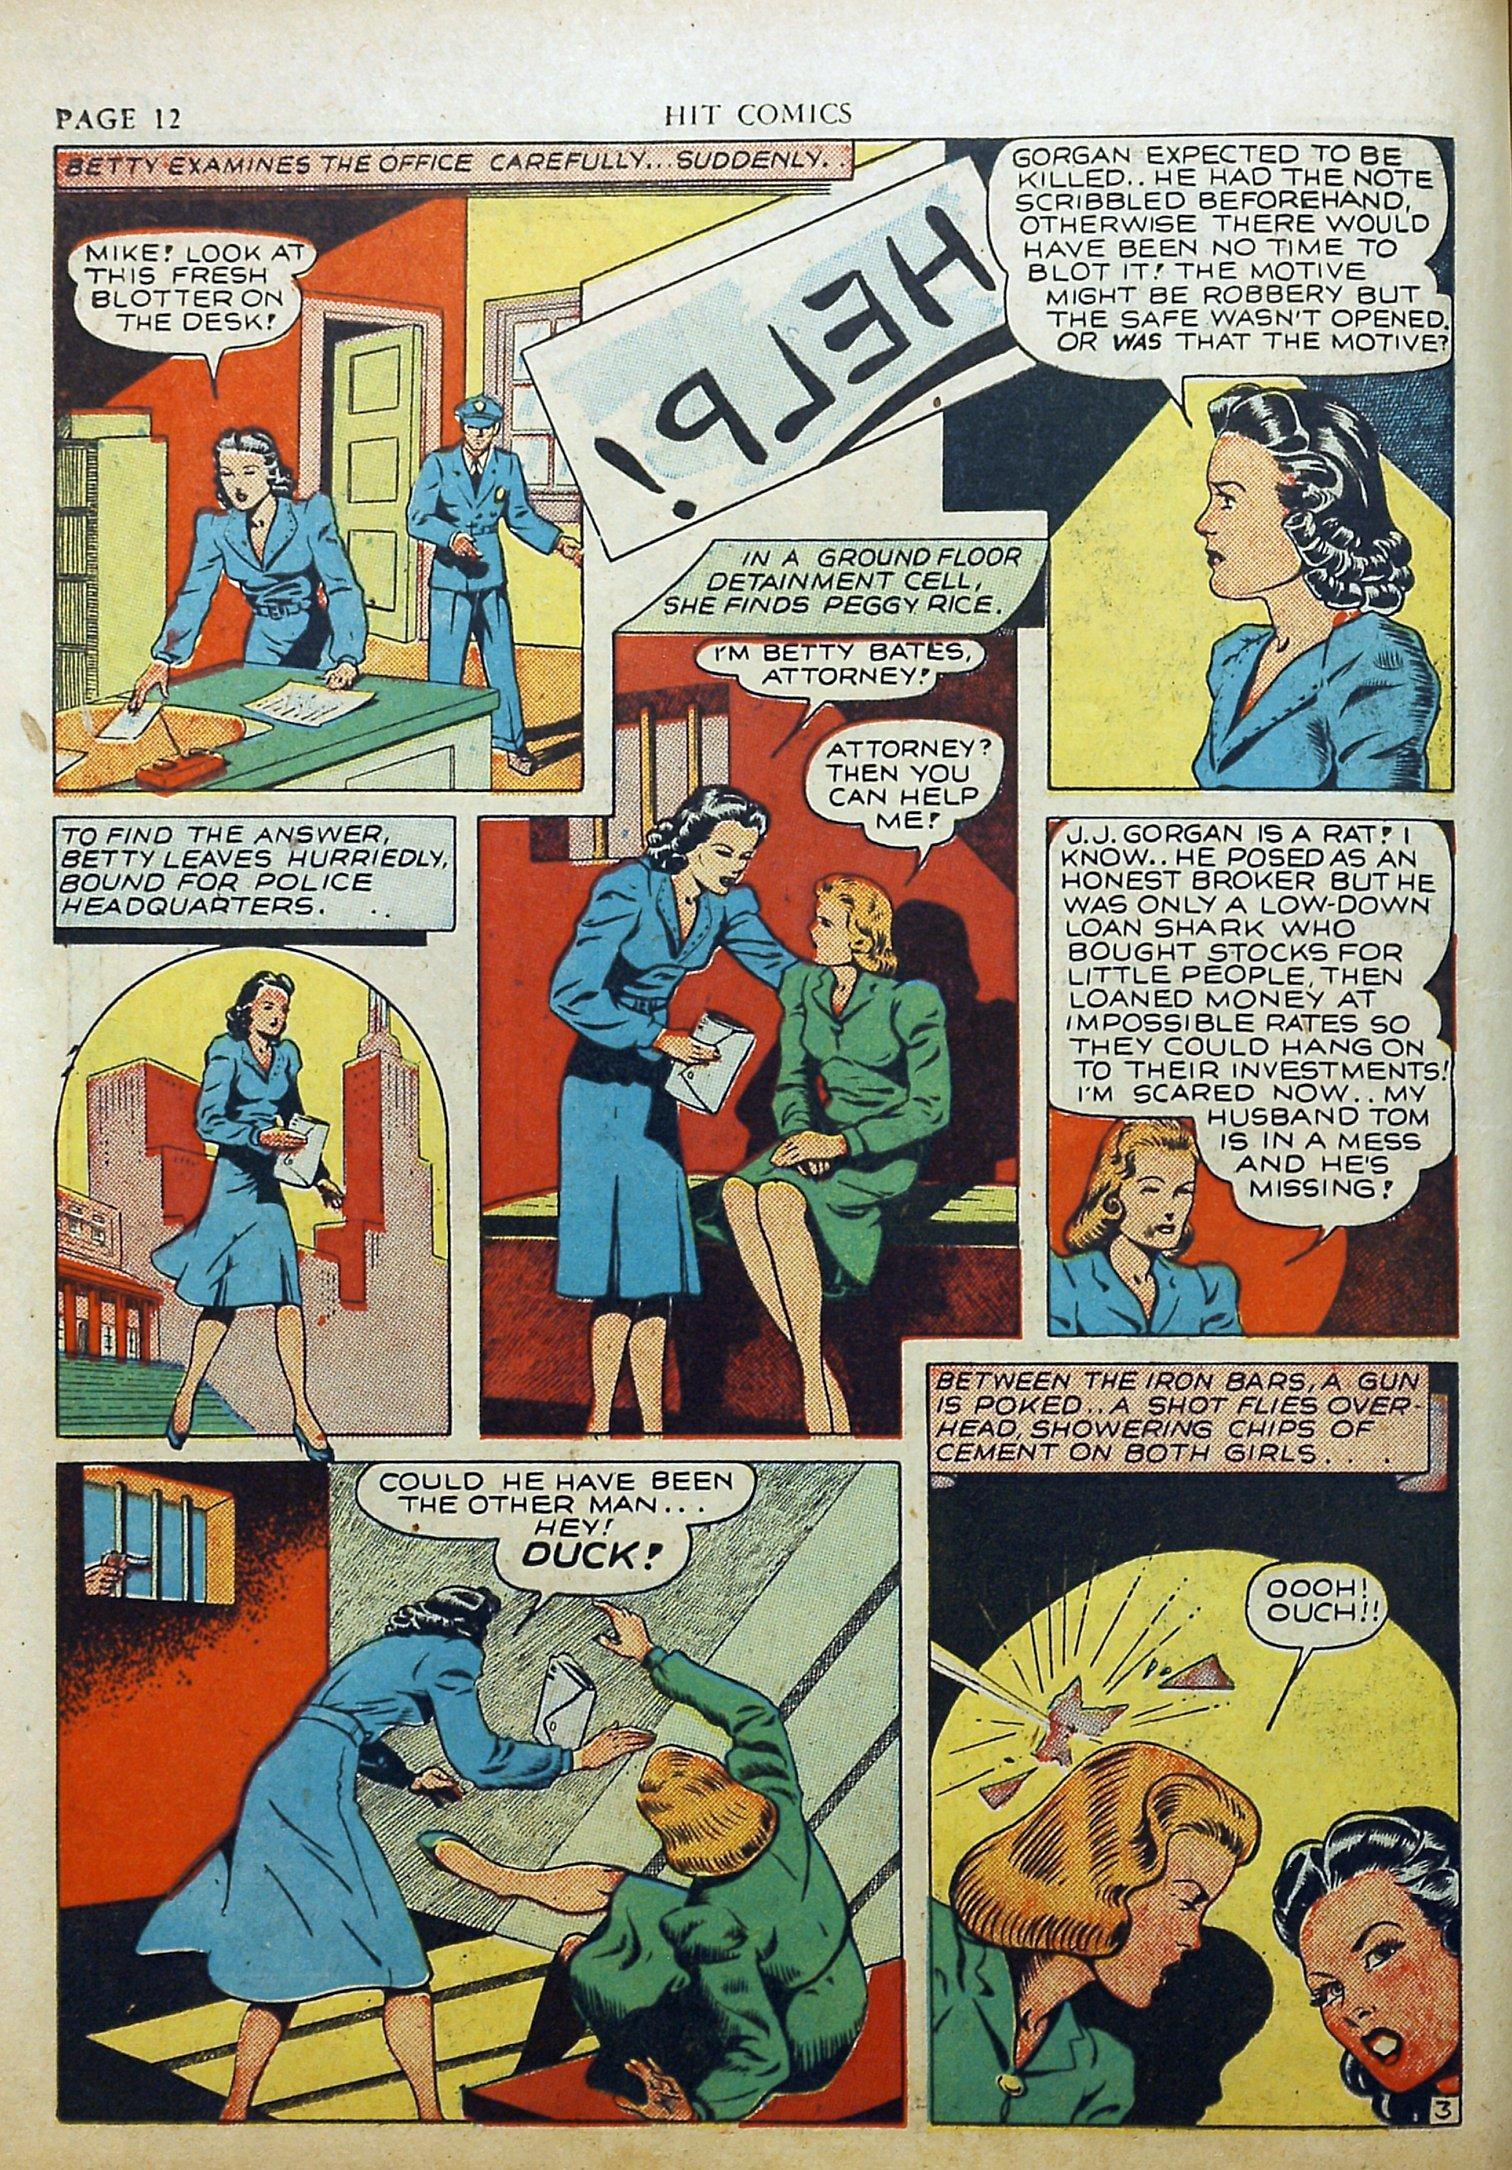 Read online Hit Comics comic -  Issue #17 - 14